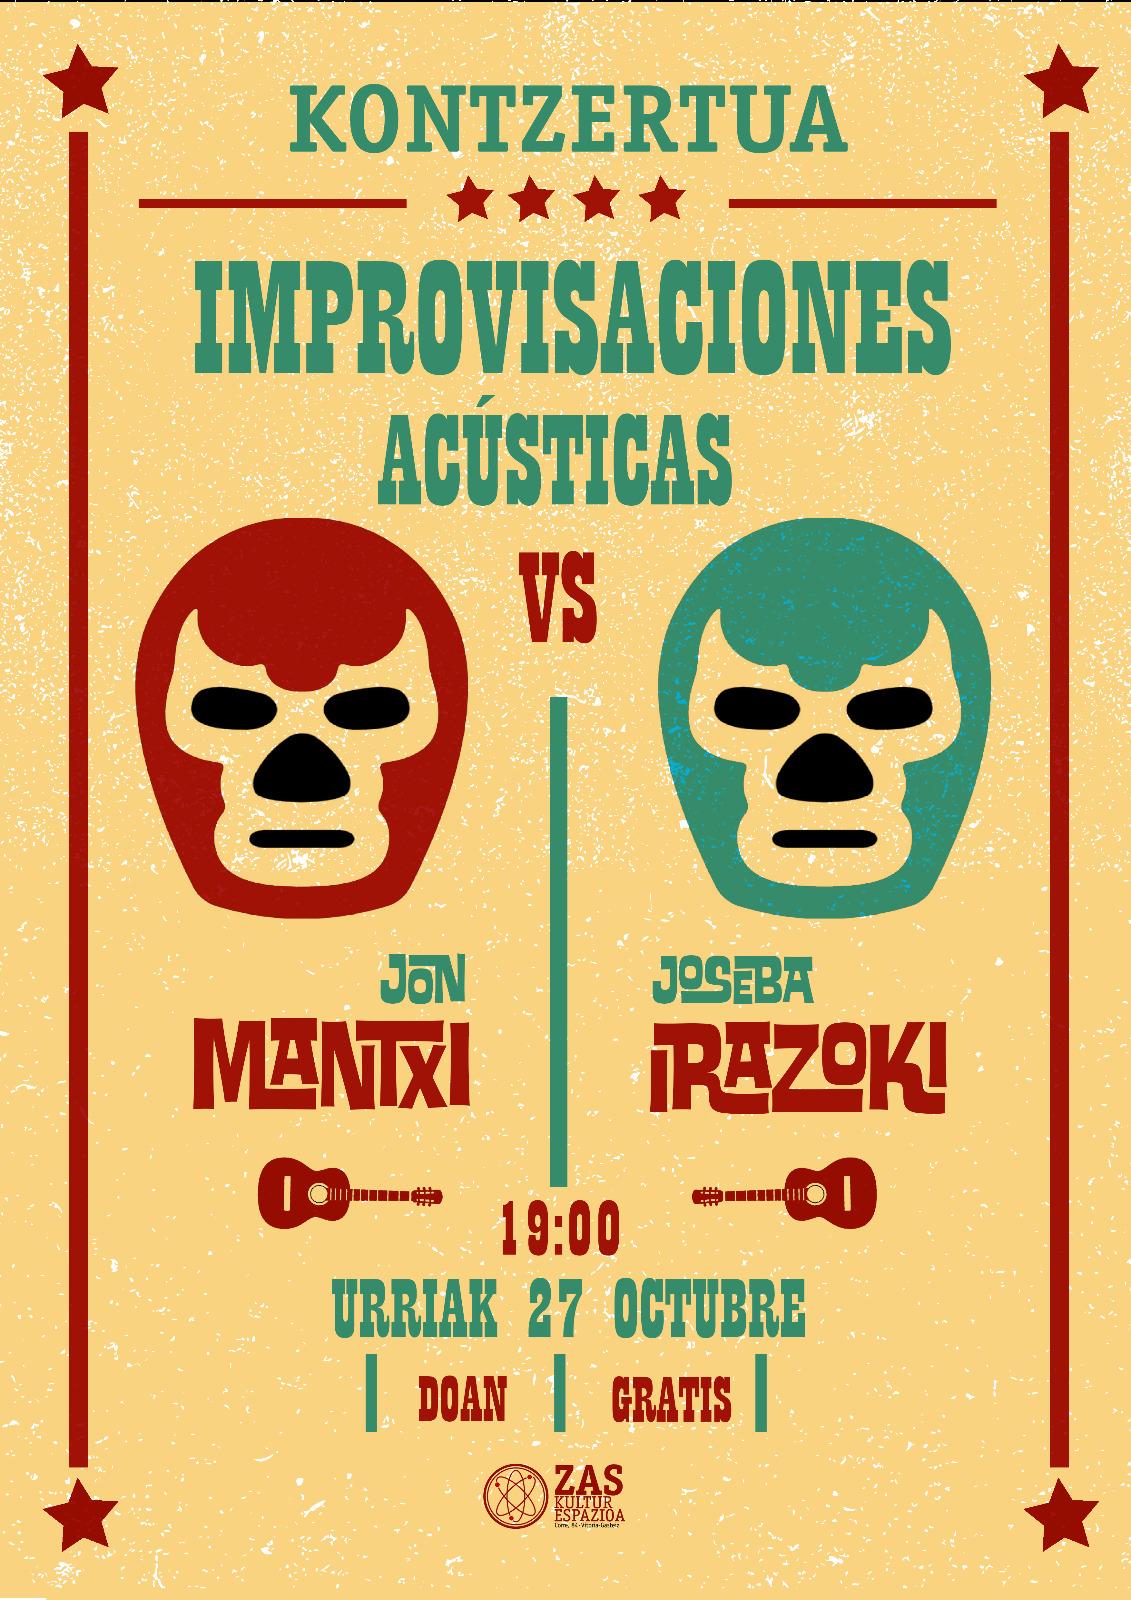 Jueves 27 OCT: Improvisaciones Acústicas, Jon Mantzi vs. JosebaIrazoki.